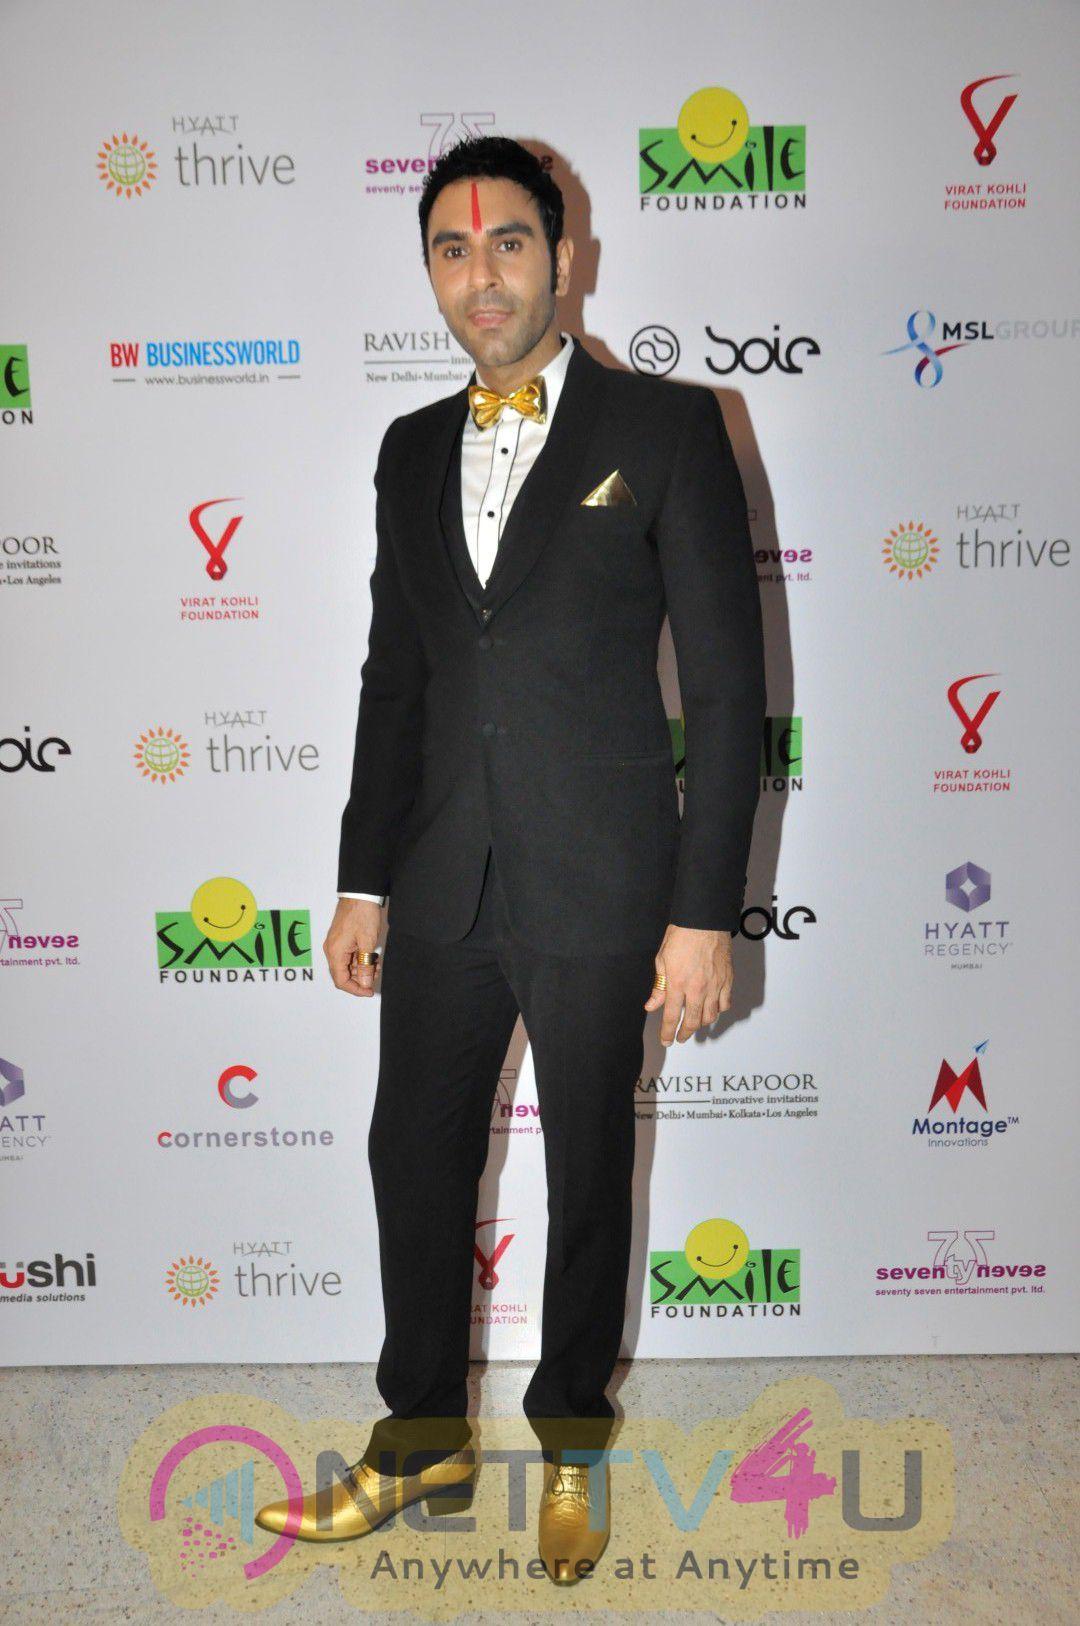 Photos Of Virat Kohli Foundation Hosts Charity Dinner With Smile Foundation